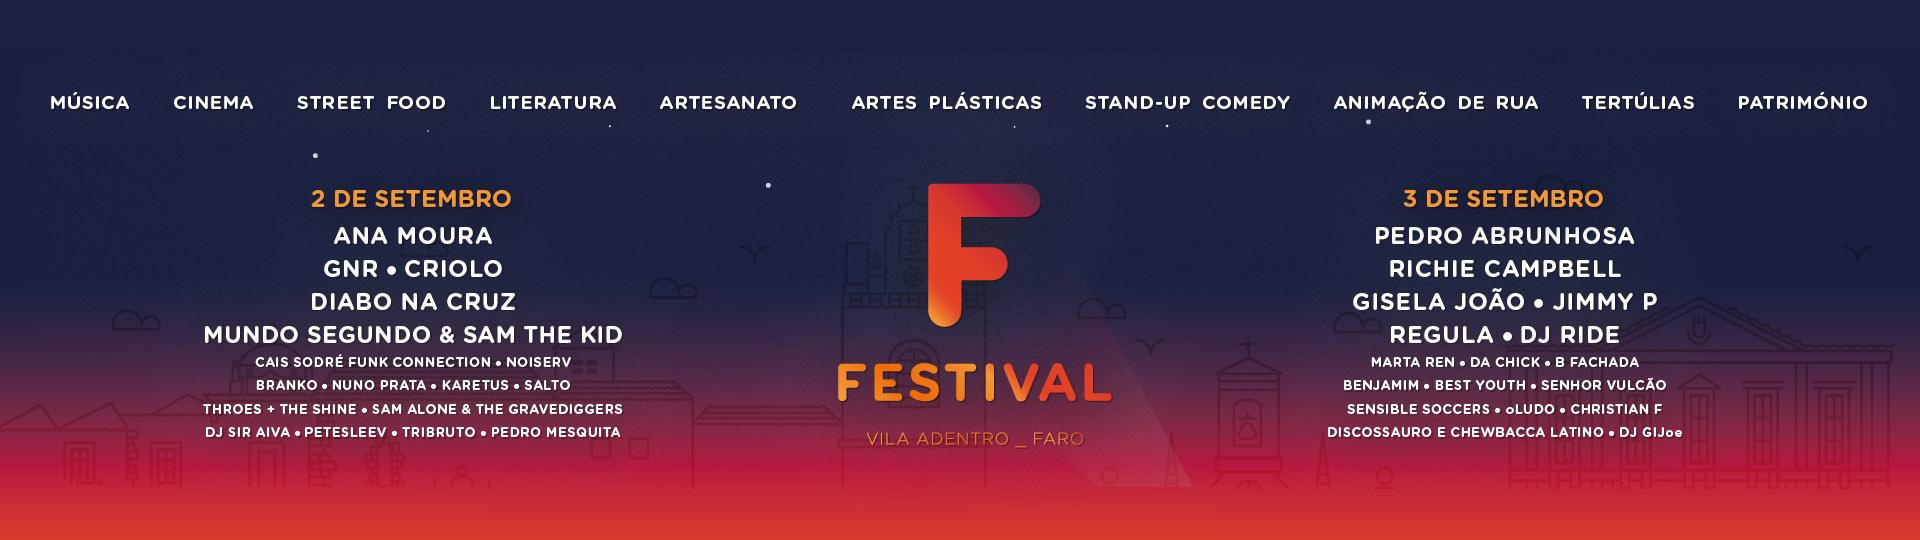 Festival F 2016